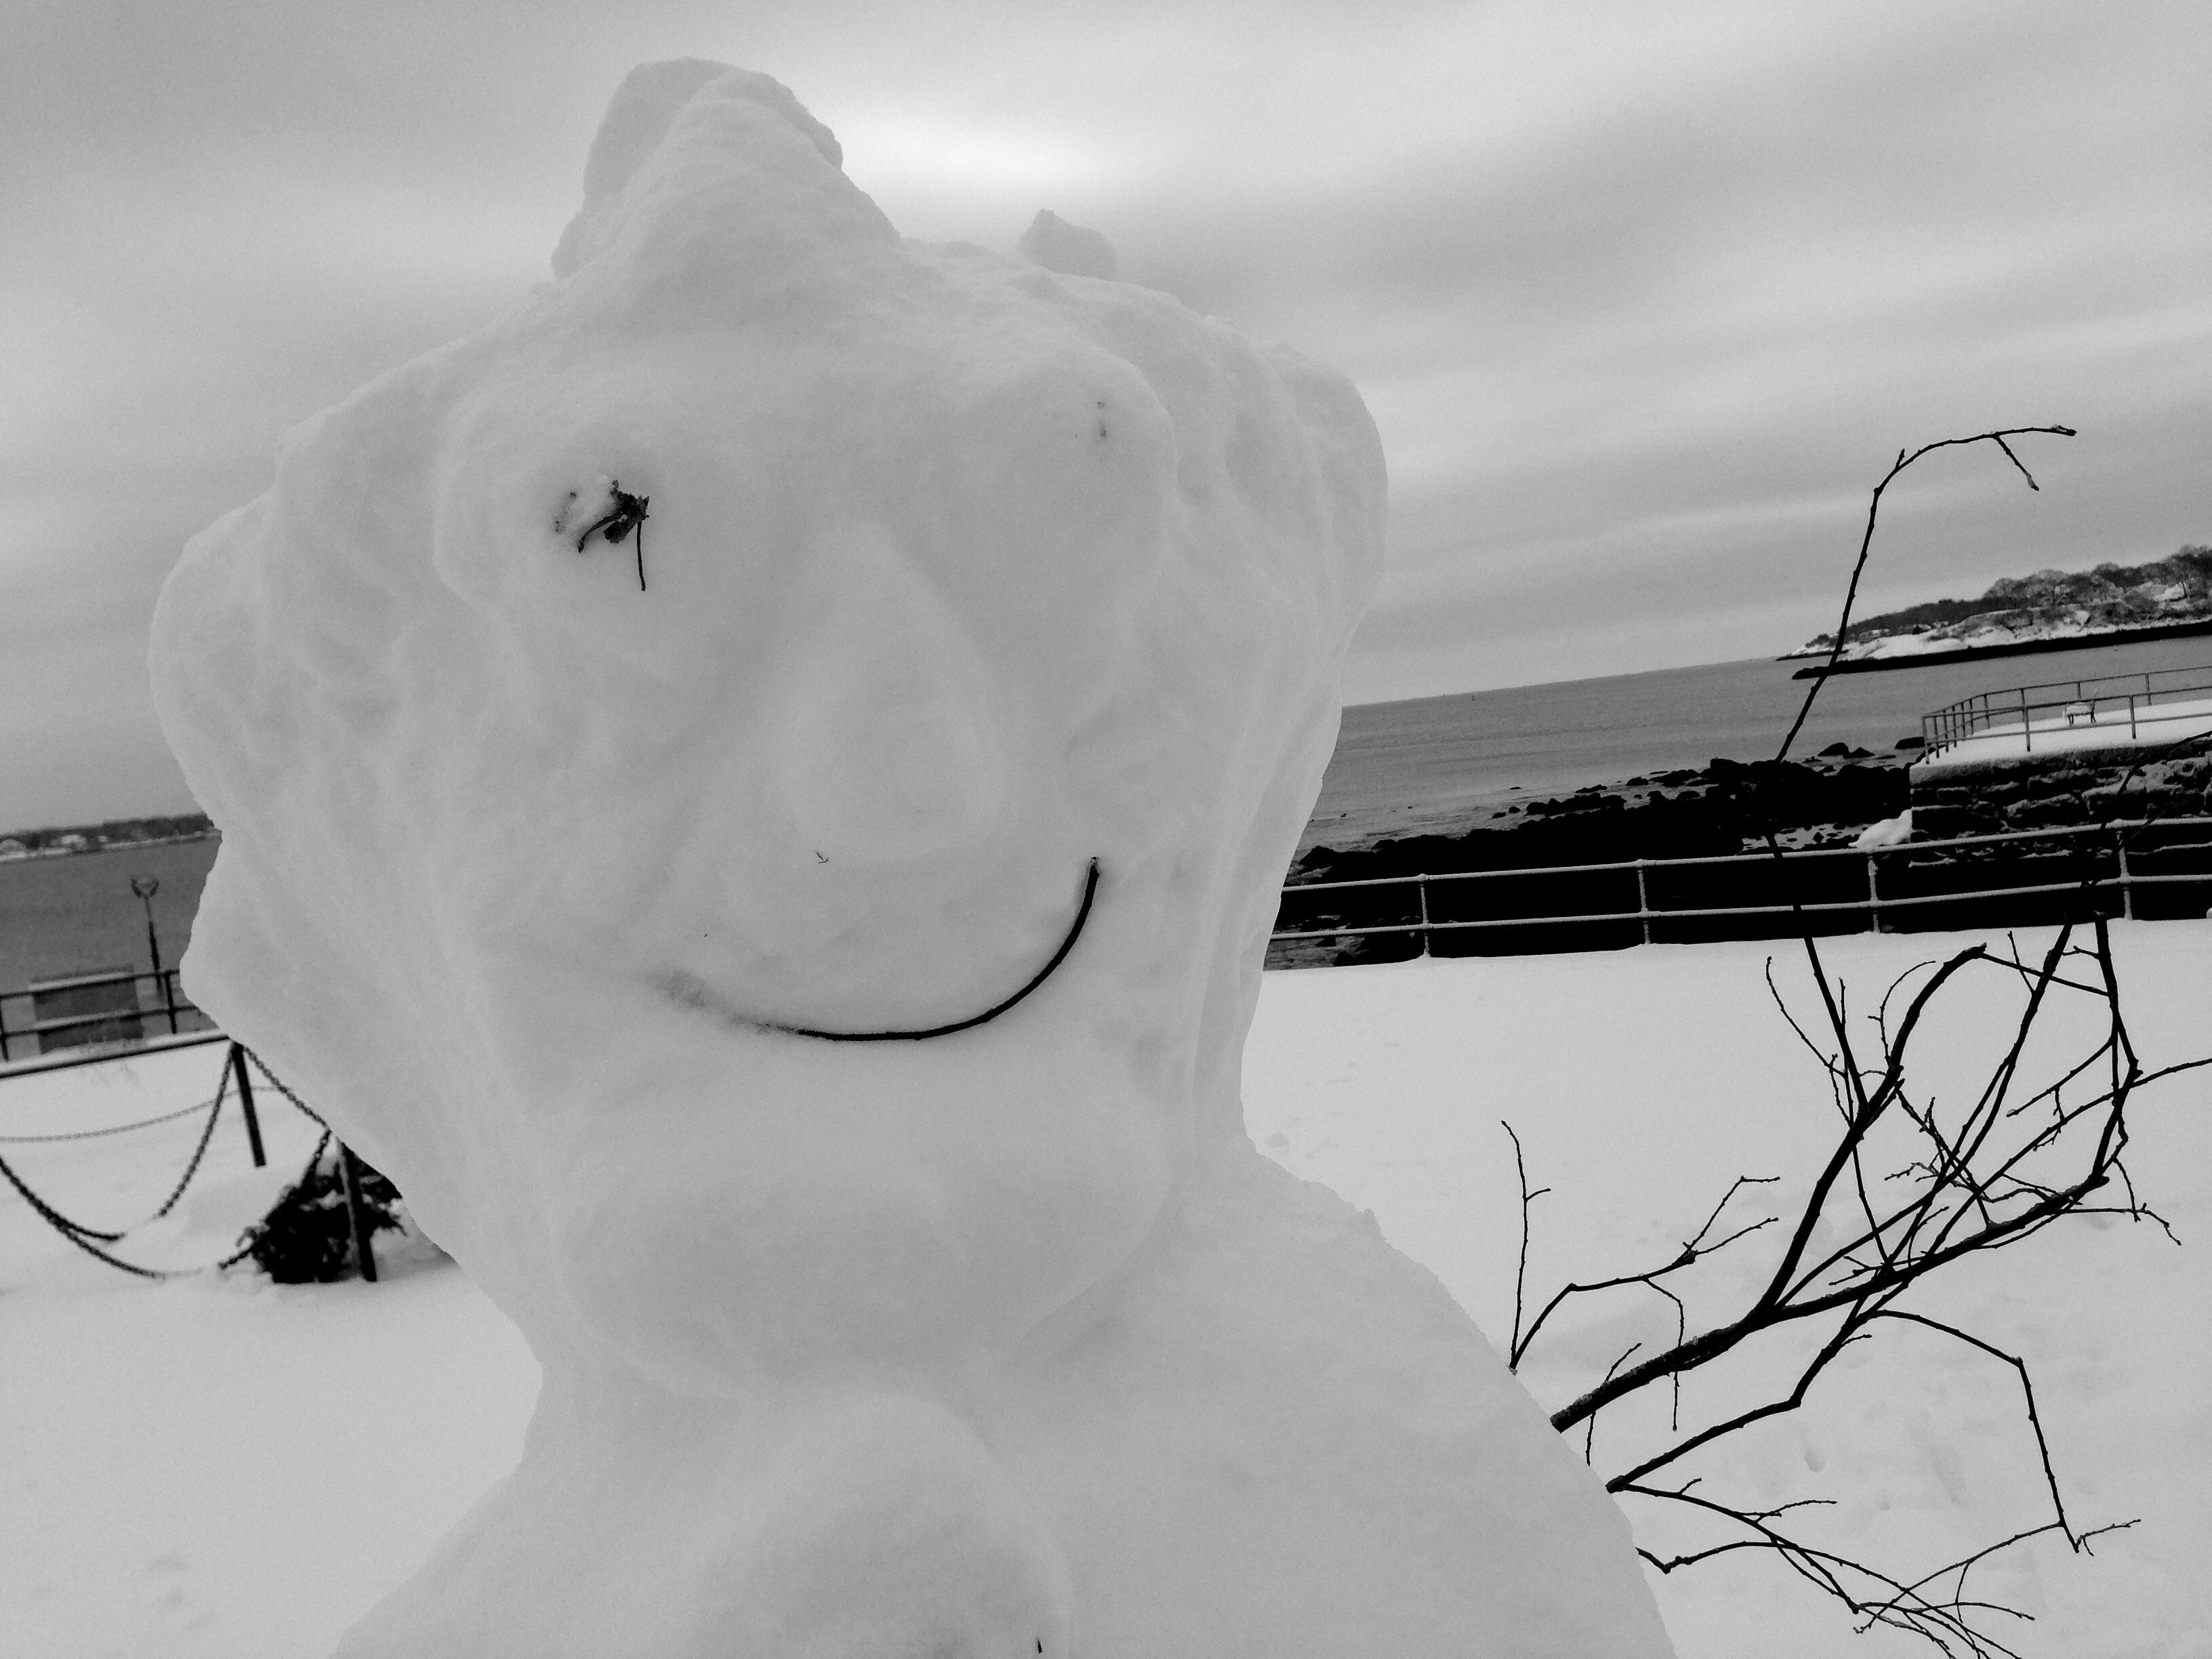 Bumpy snowman at the Blvd.